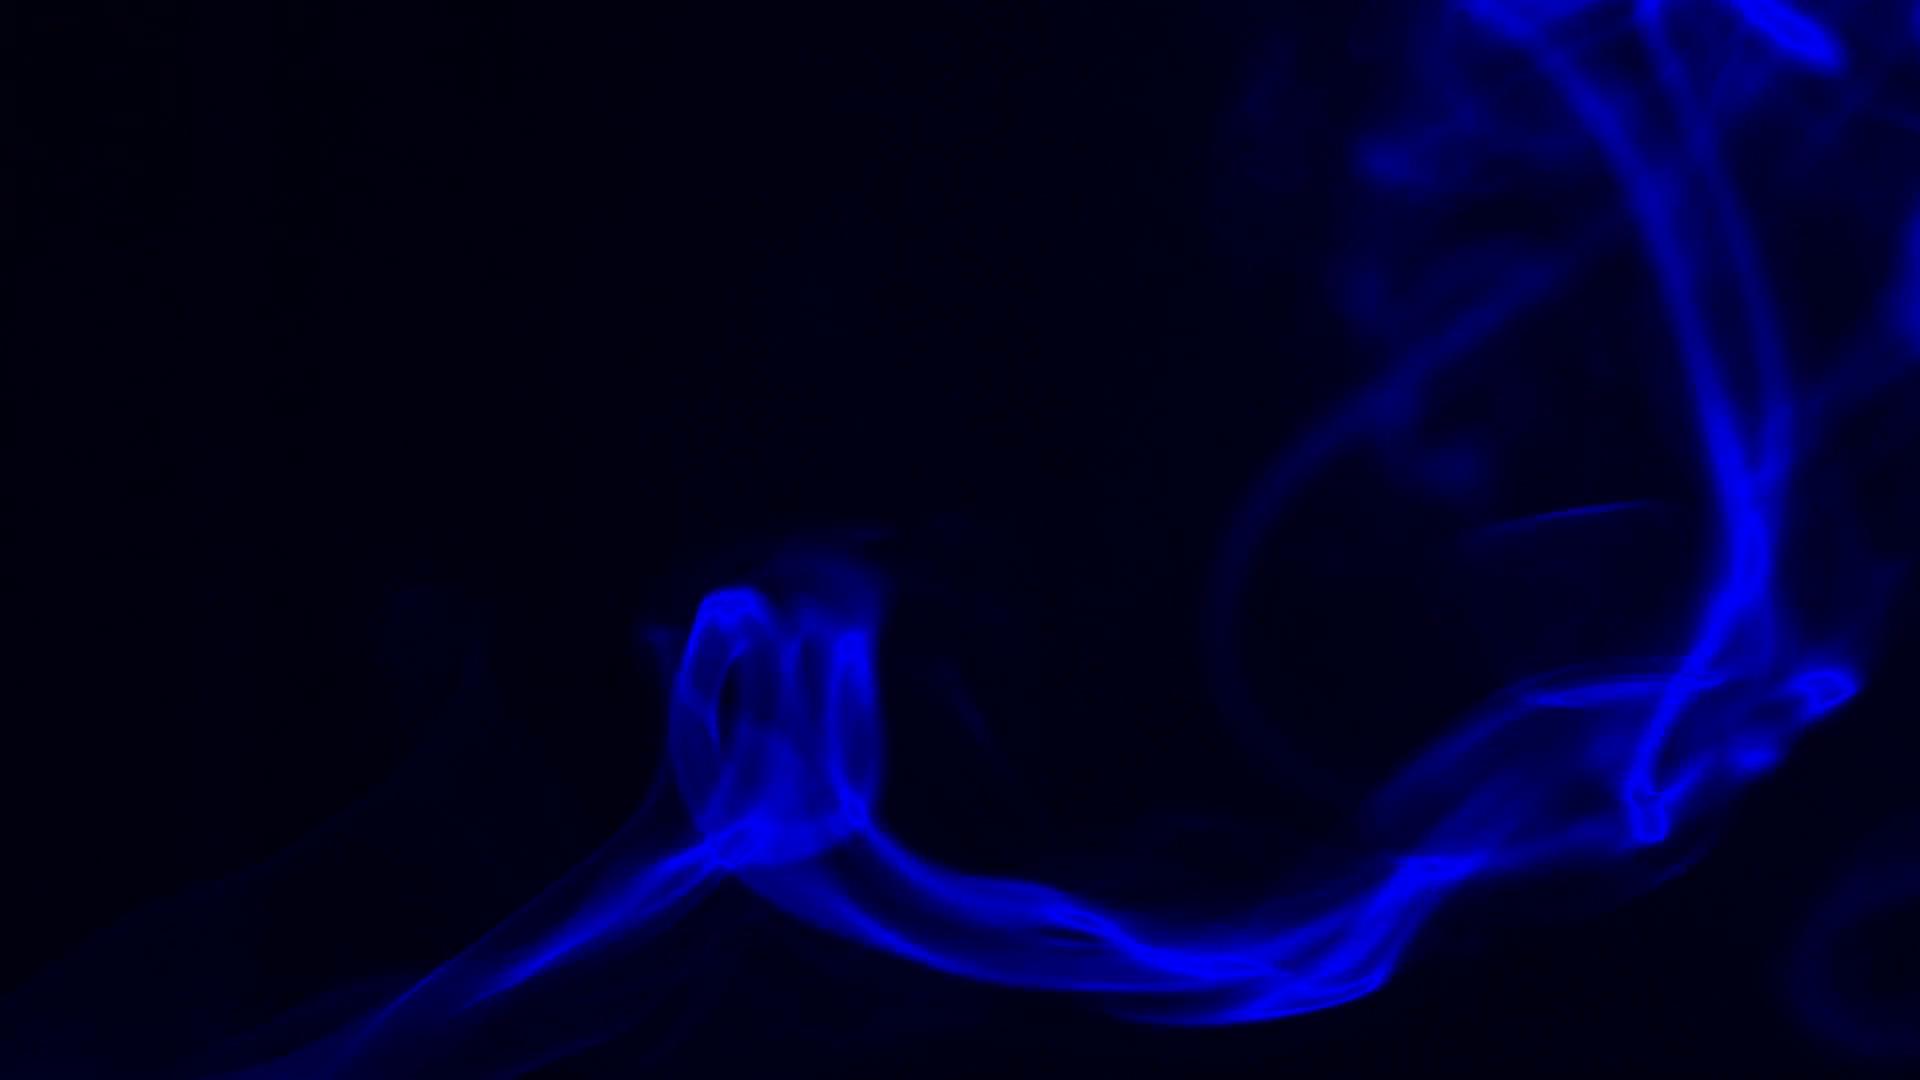 Texture blue smoke on black background Stock Video Footage - Videoblocks